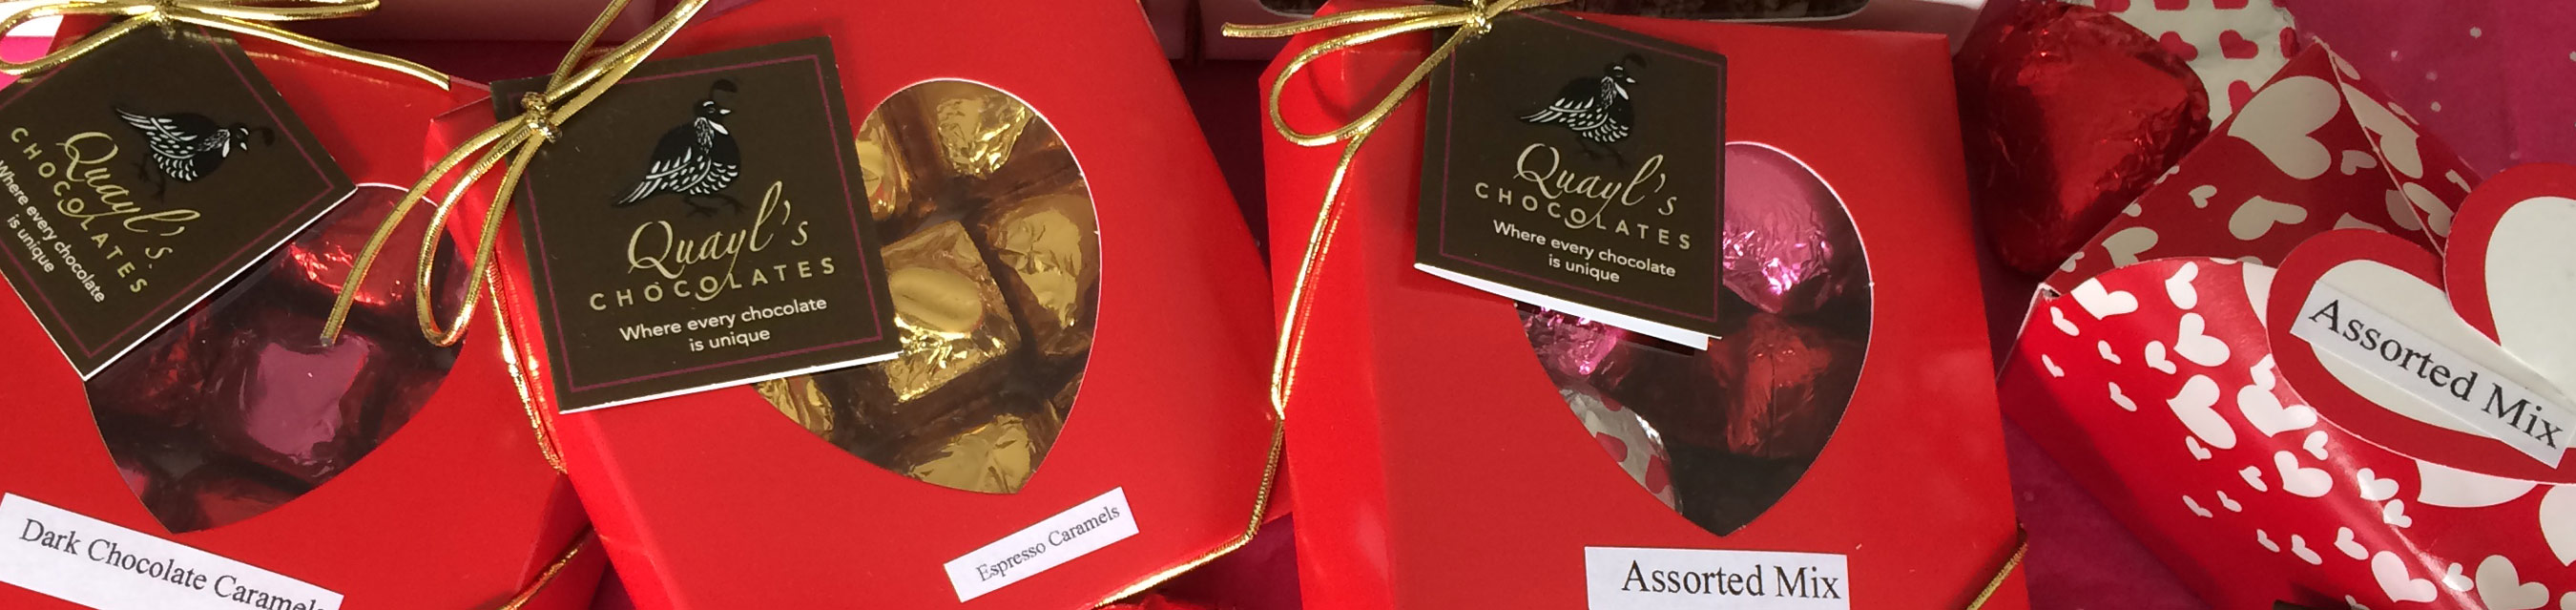 Quayls Chocolates, homemade Vermont Chocolates from Warren Vermont